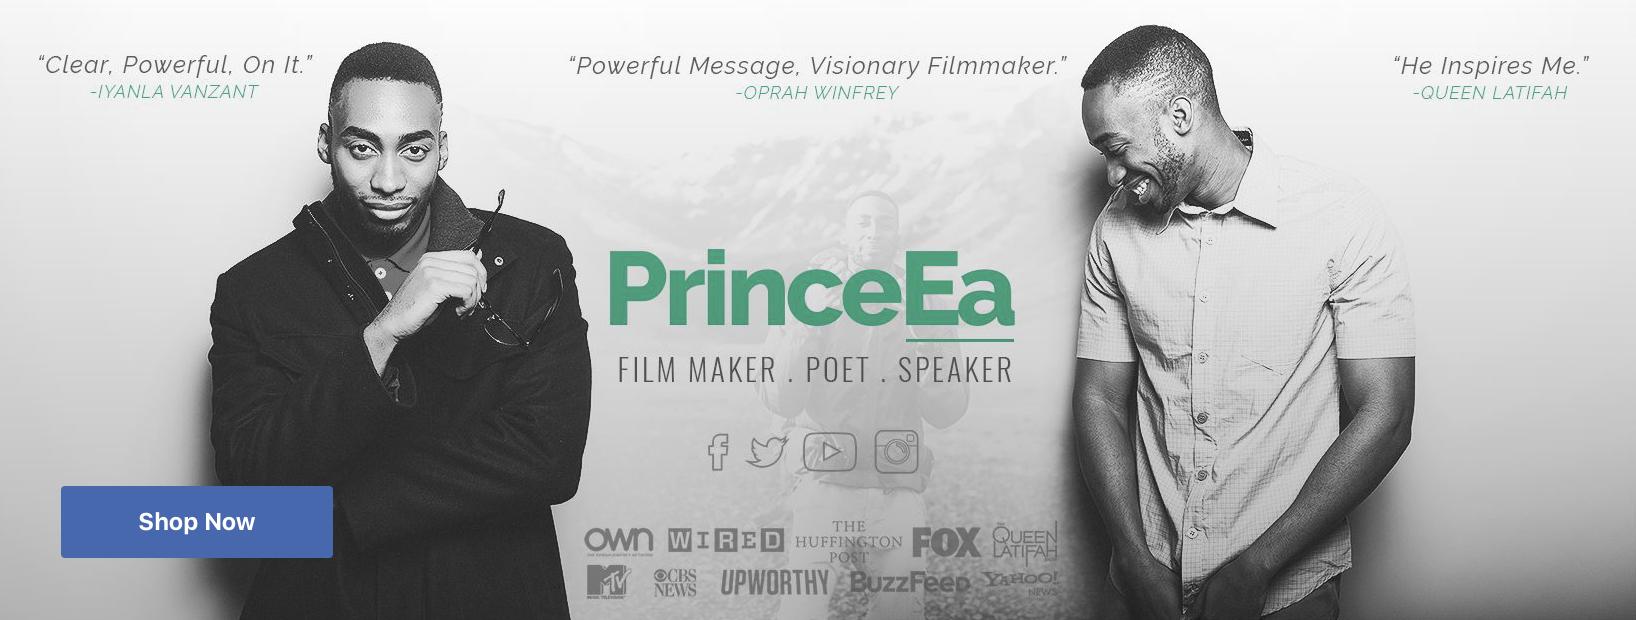 PrinceEa Facebook Page Image